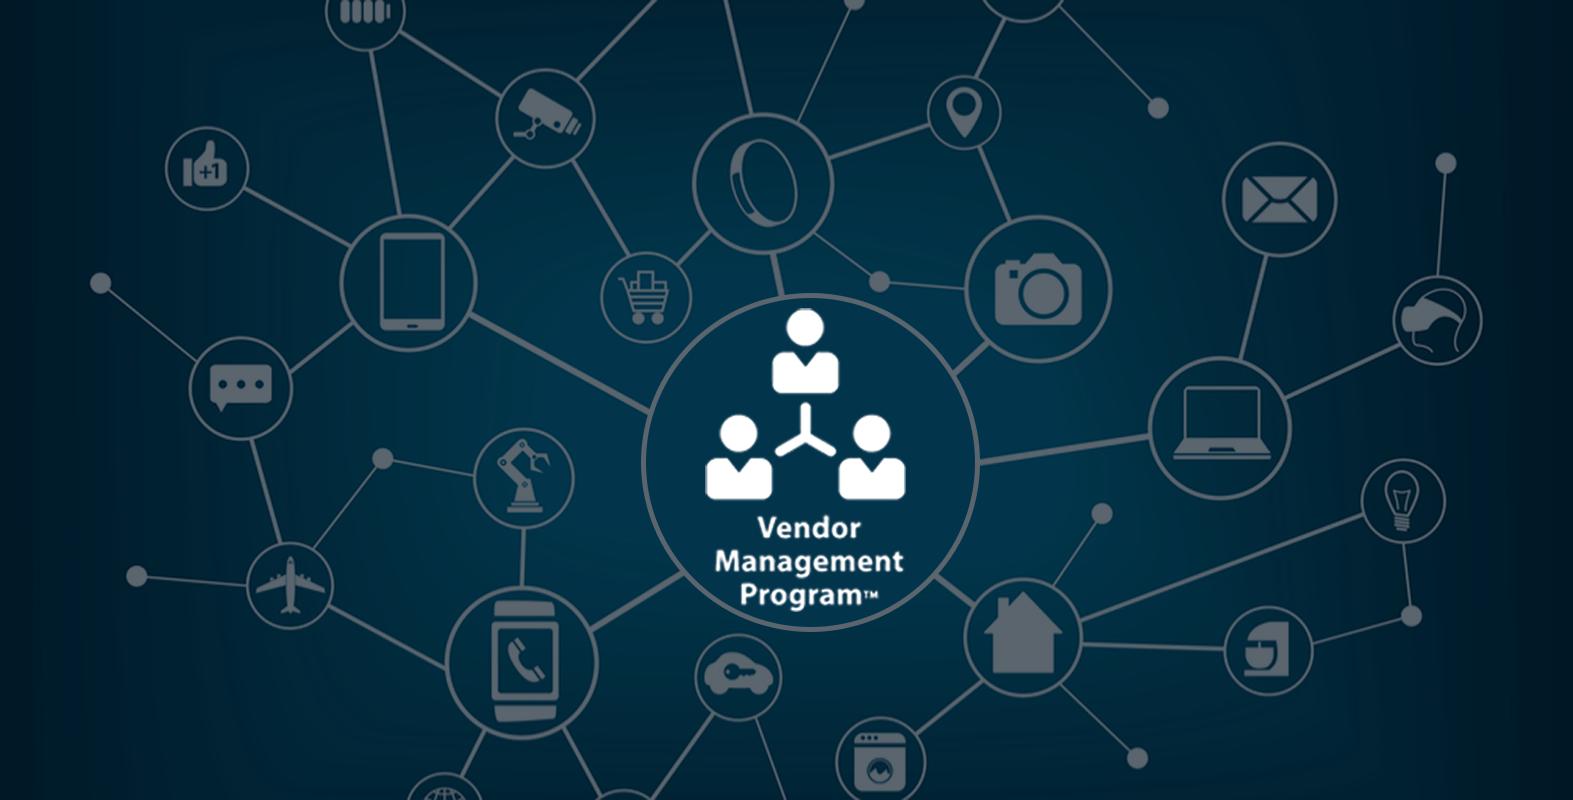 Command expands its Vendor Management Program to meet growing national customer demand